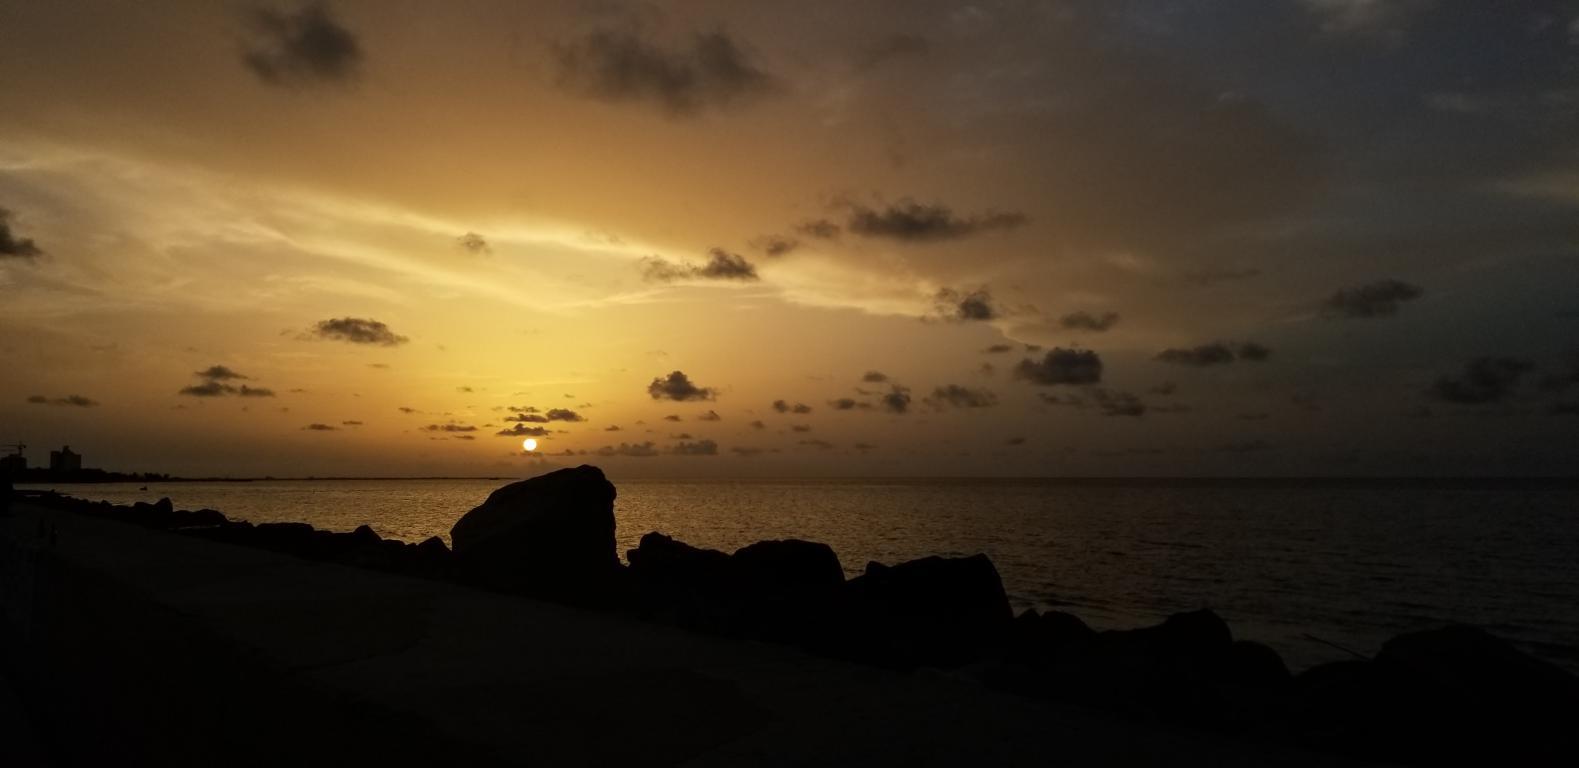 Déménagement en Guyane - Déménagement Outre Mer - Aux Déménageurs Méditerranéens